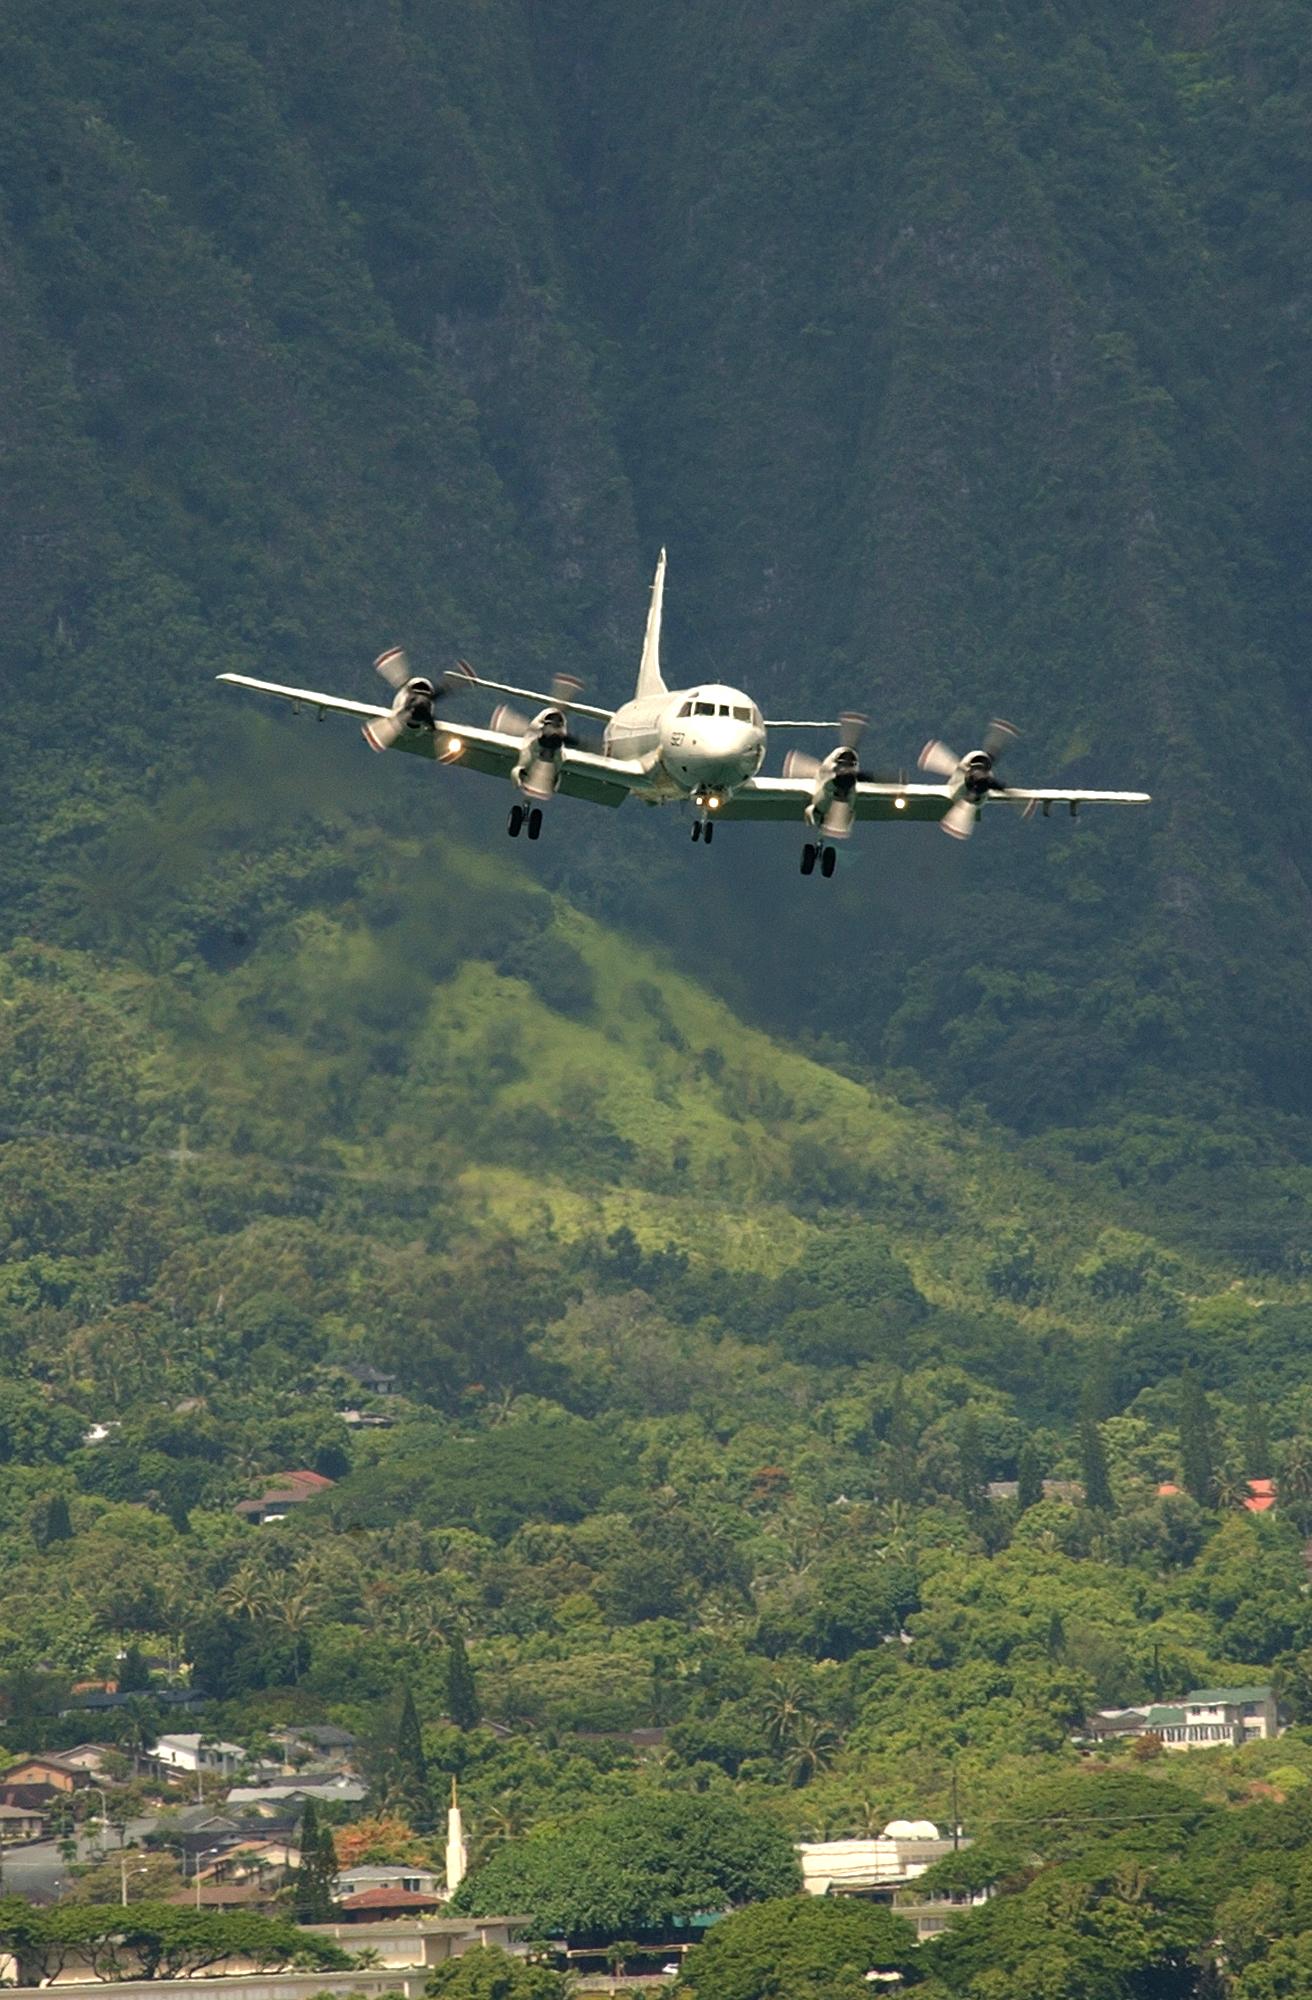 File:US Navy 040707-N-6932B-019 A U.S. Navy P-3C Orion ...